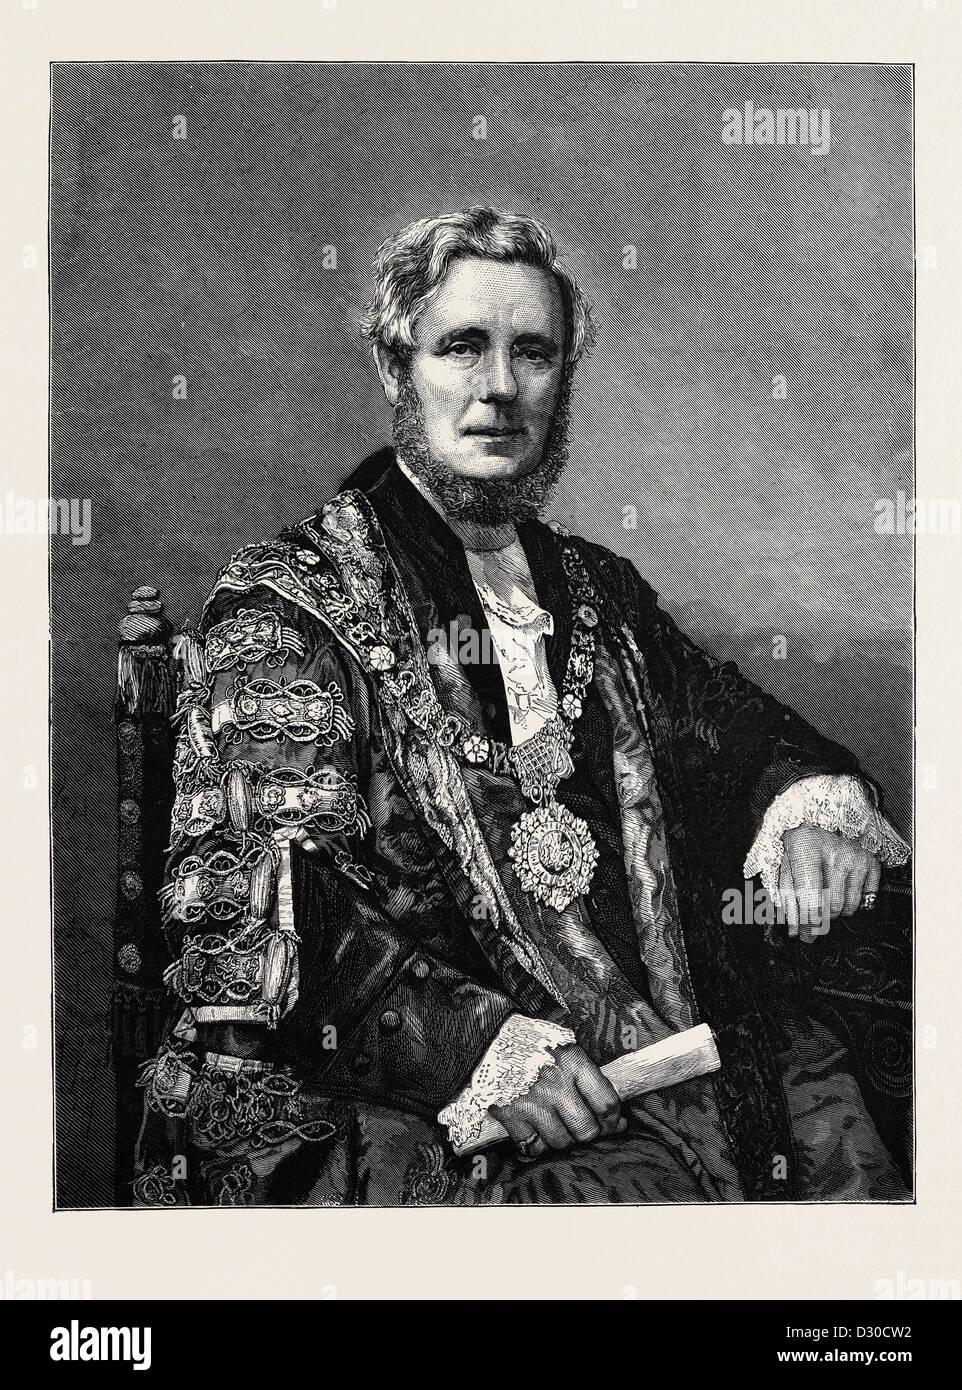 L'onorevole SIR SYDNEY HEDLEY WATERLOW, KNT., sindaco di Londra Immagini Stock